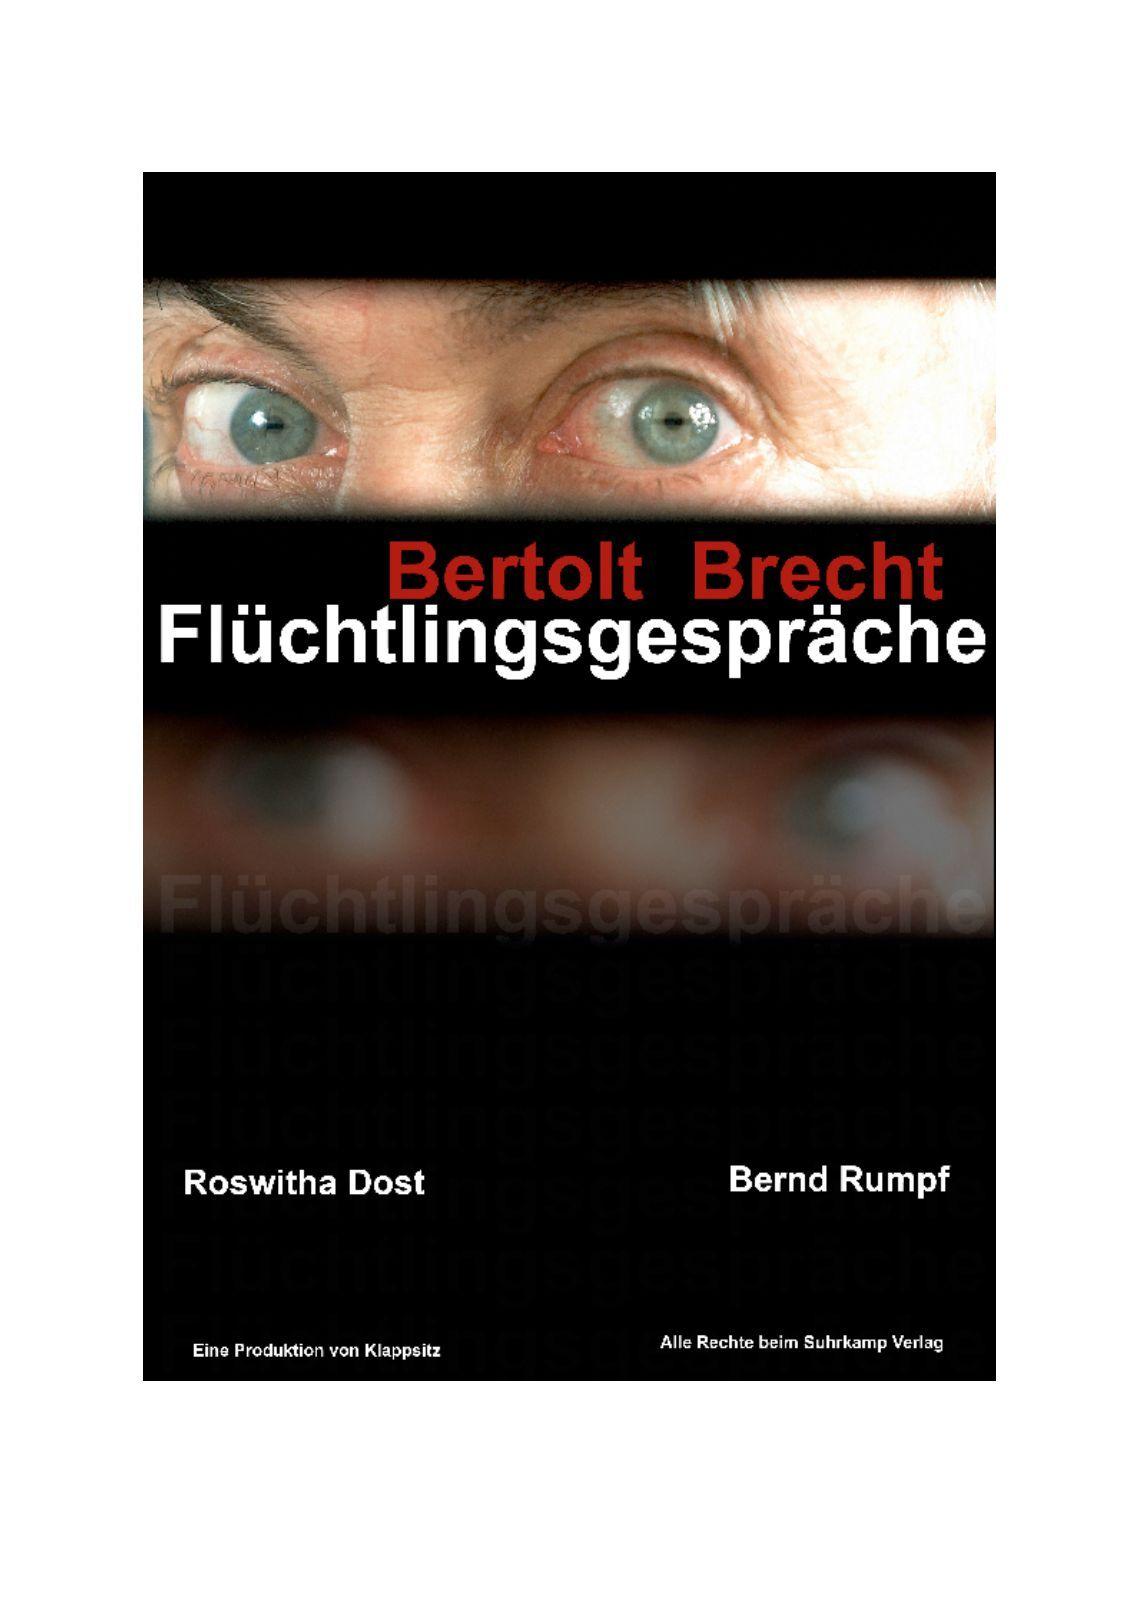 4 free magazines from kulturtaeter.ch